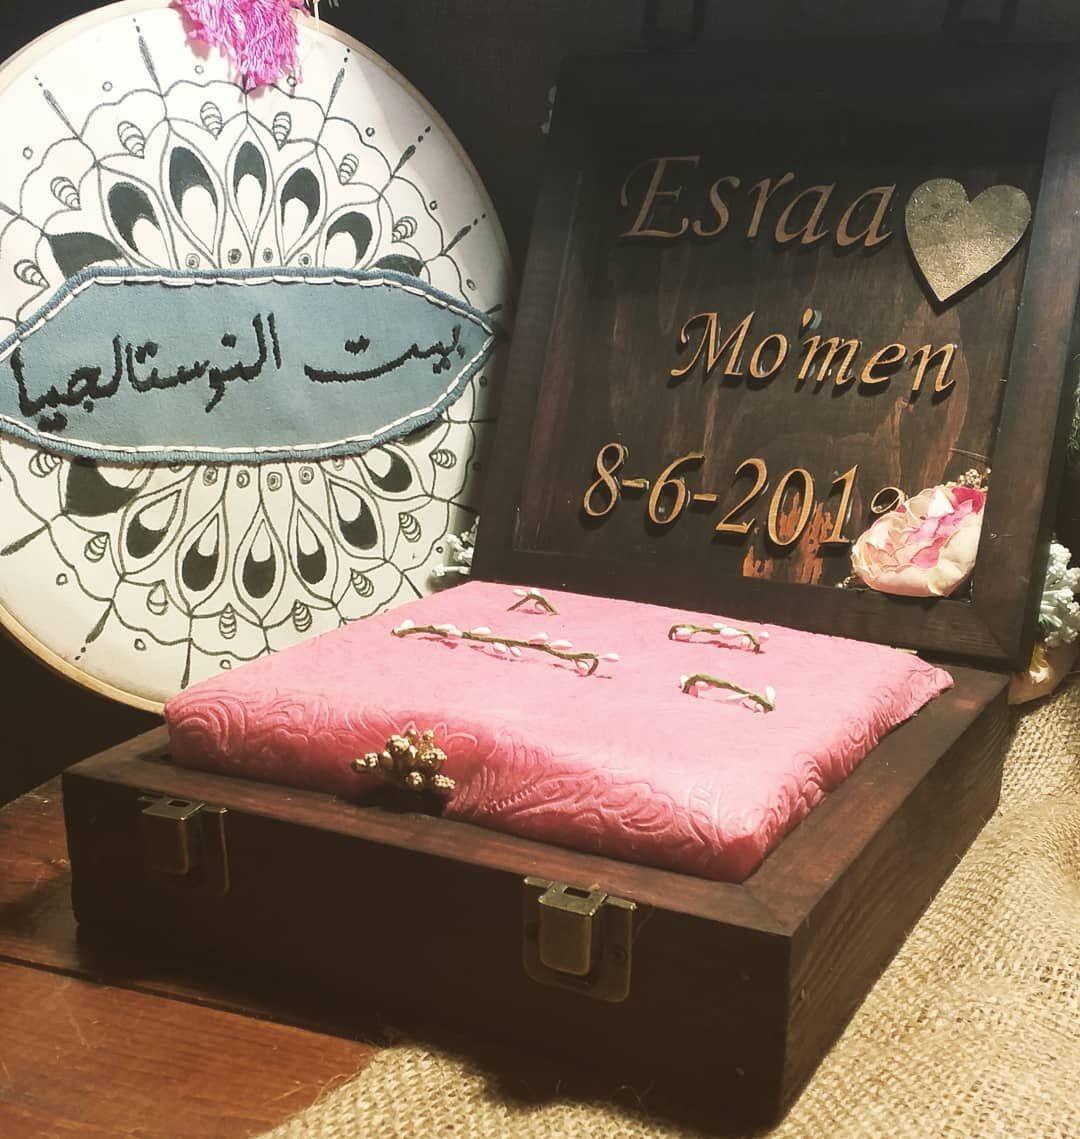 New The 10 Best Crafts Today With Pictures صندوق تقديم الشبكة تقدروا تختاروا كل تفاصيله بنفسكم واحنا علينا التنفيذ Ringbox Vintagebox Luggage Suitcase